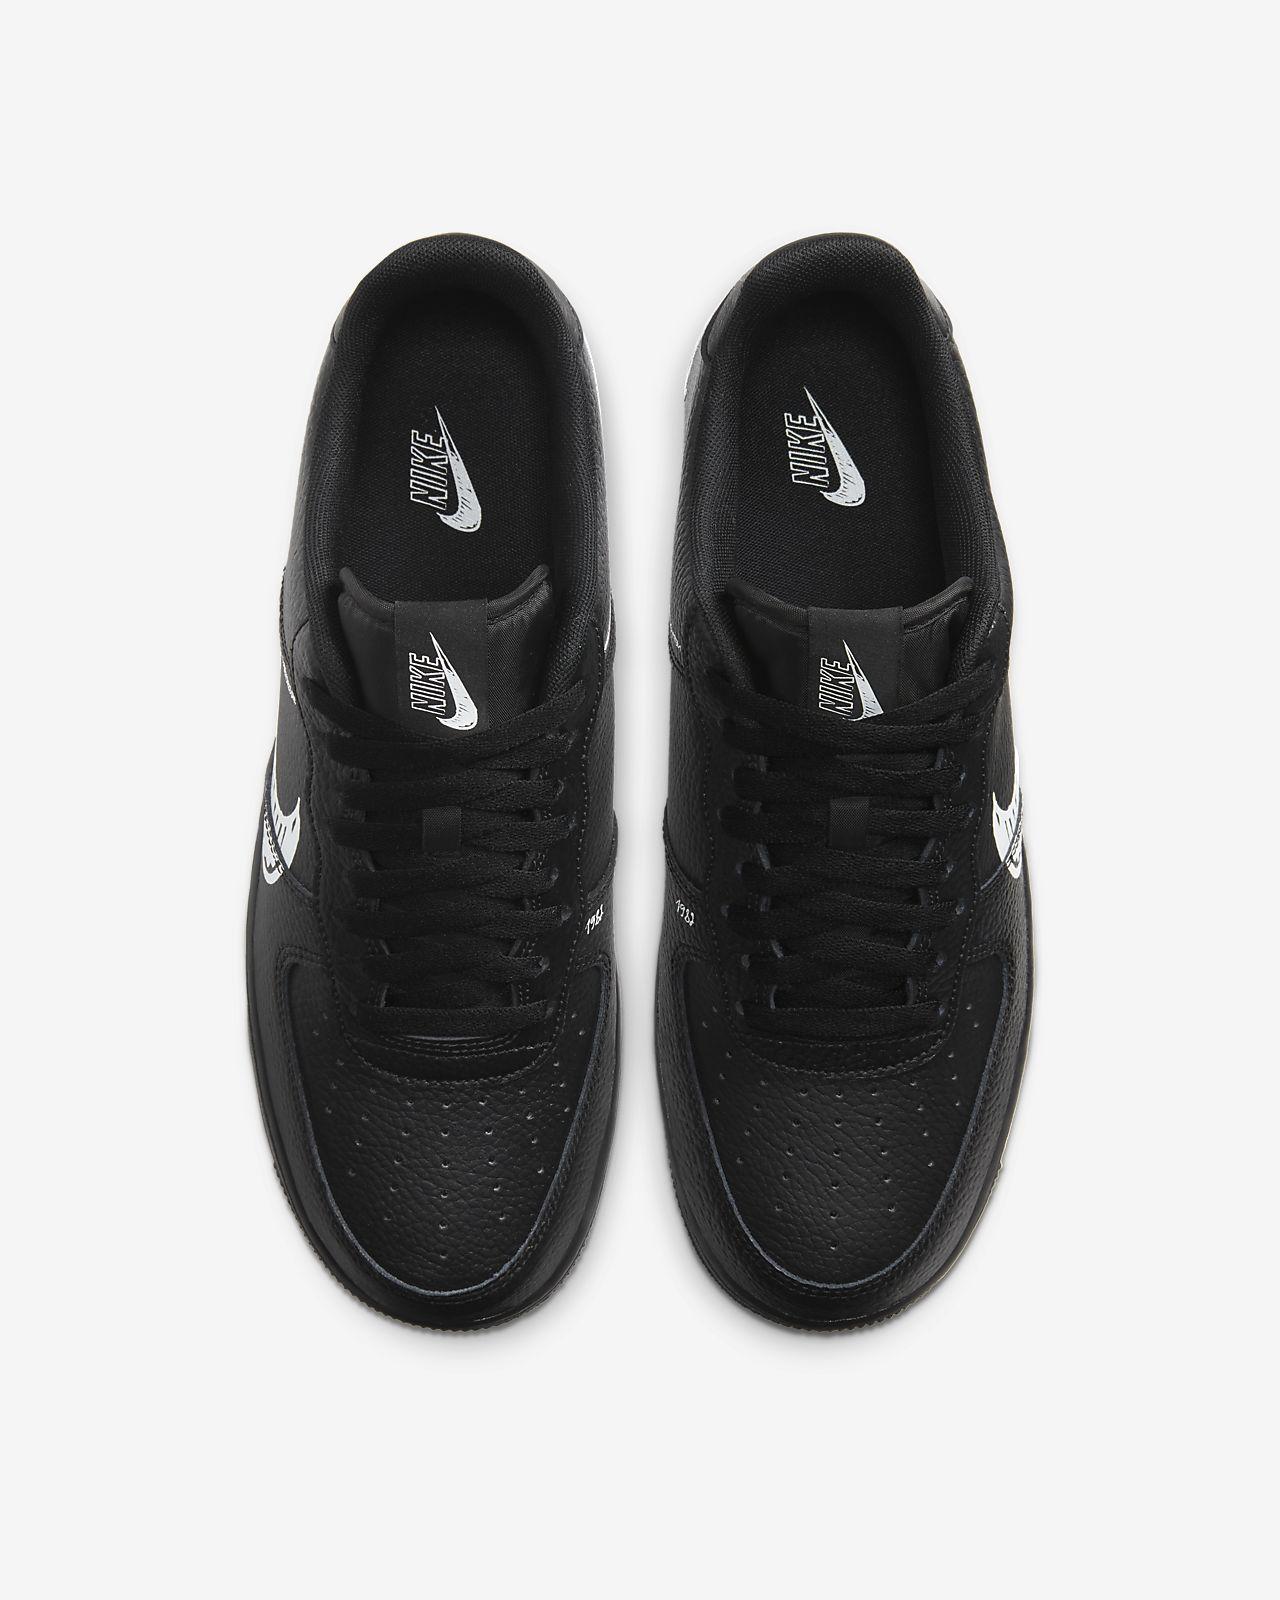 Nike Air Force 1 LV8 Utility Men's Shoe